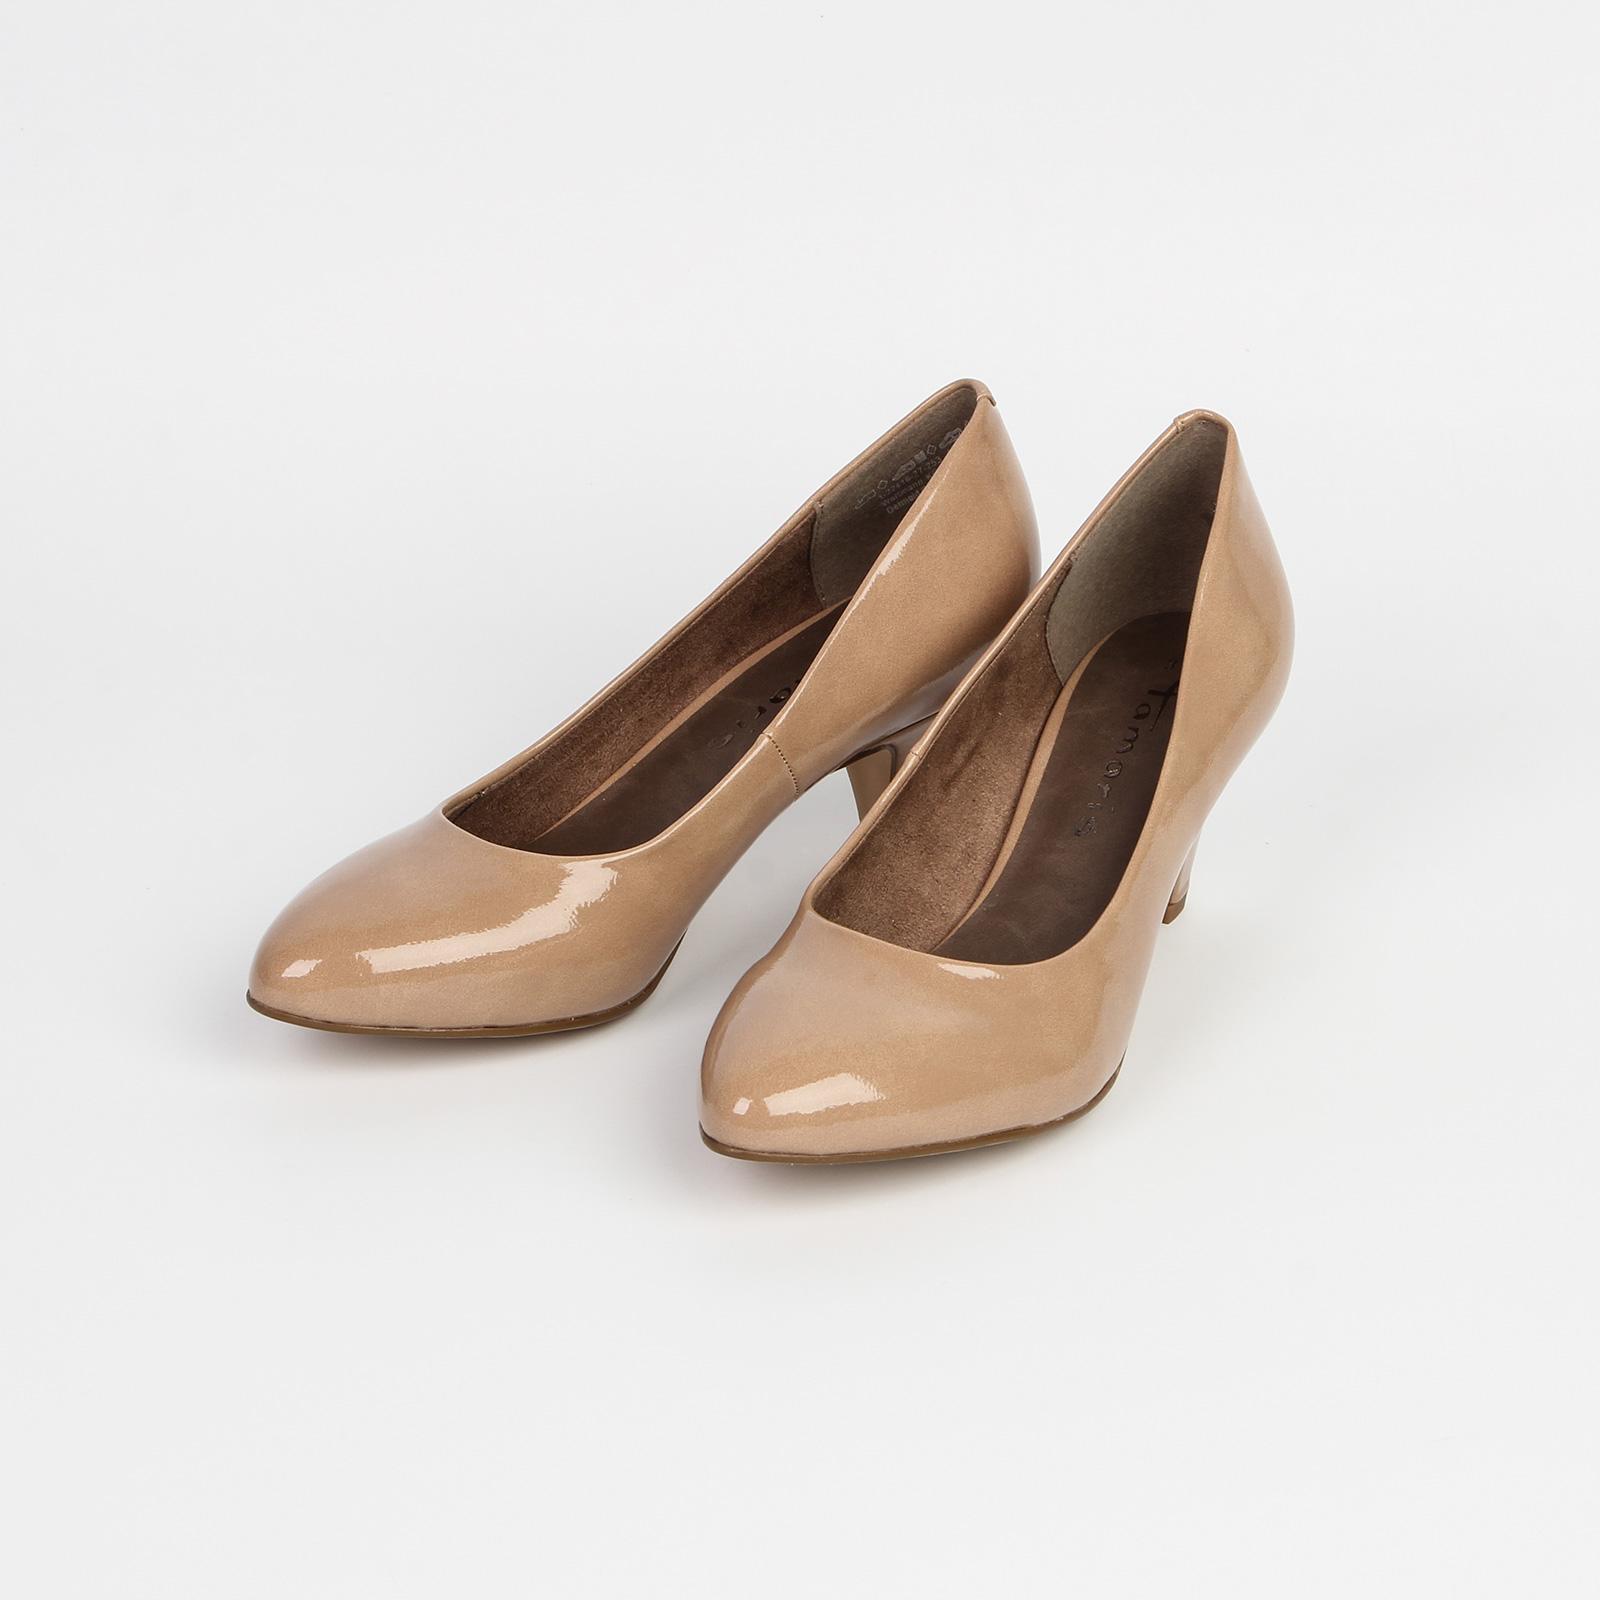 Лодочки женские классические на каблуке